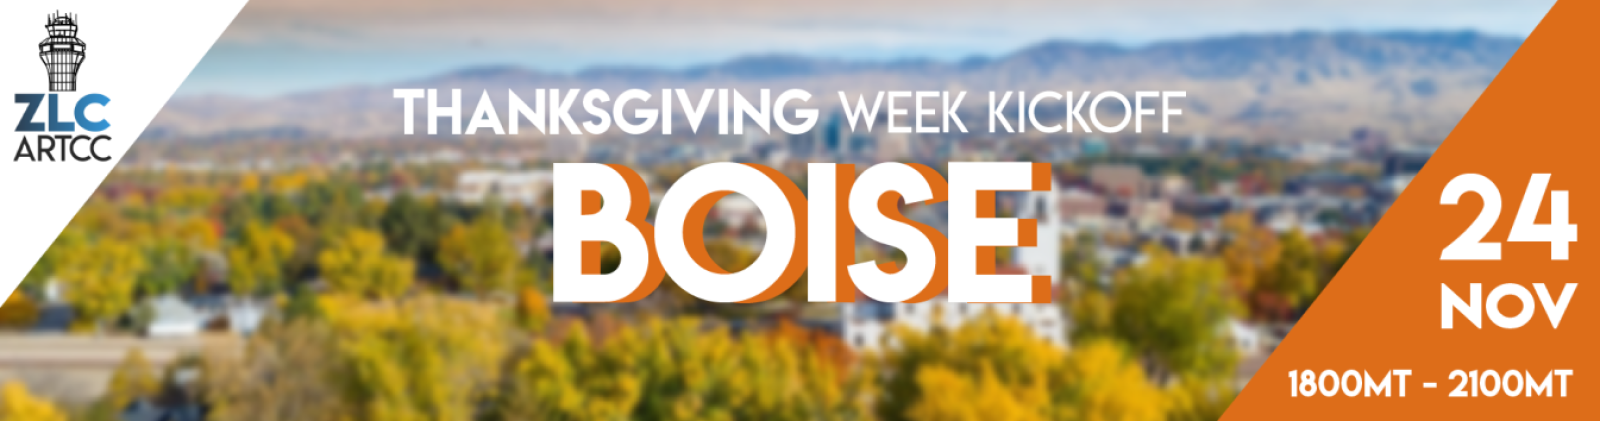 ZLC Event Support: Thanksgiving Week Kickoff